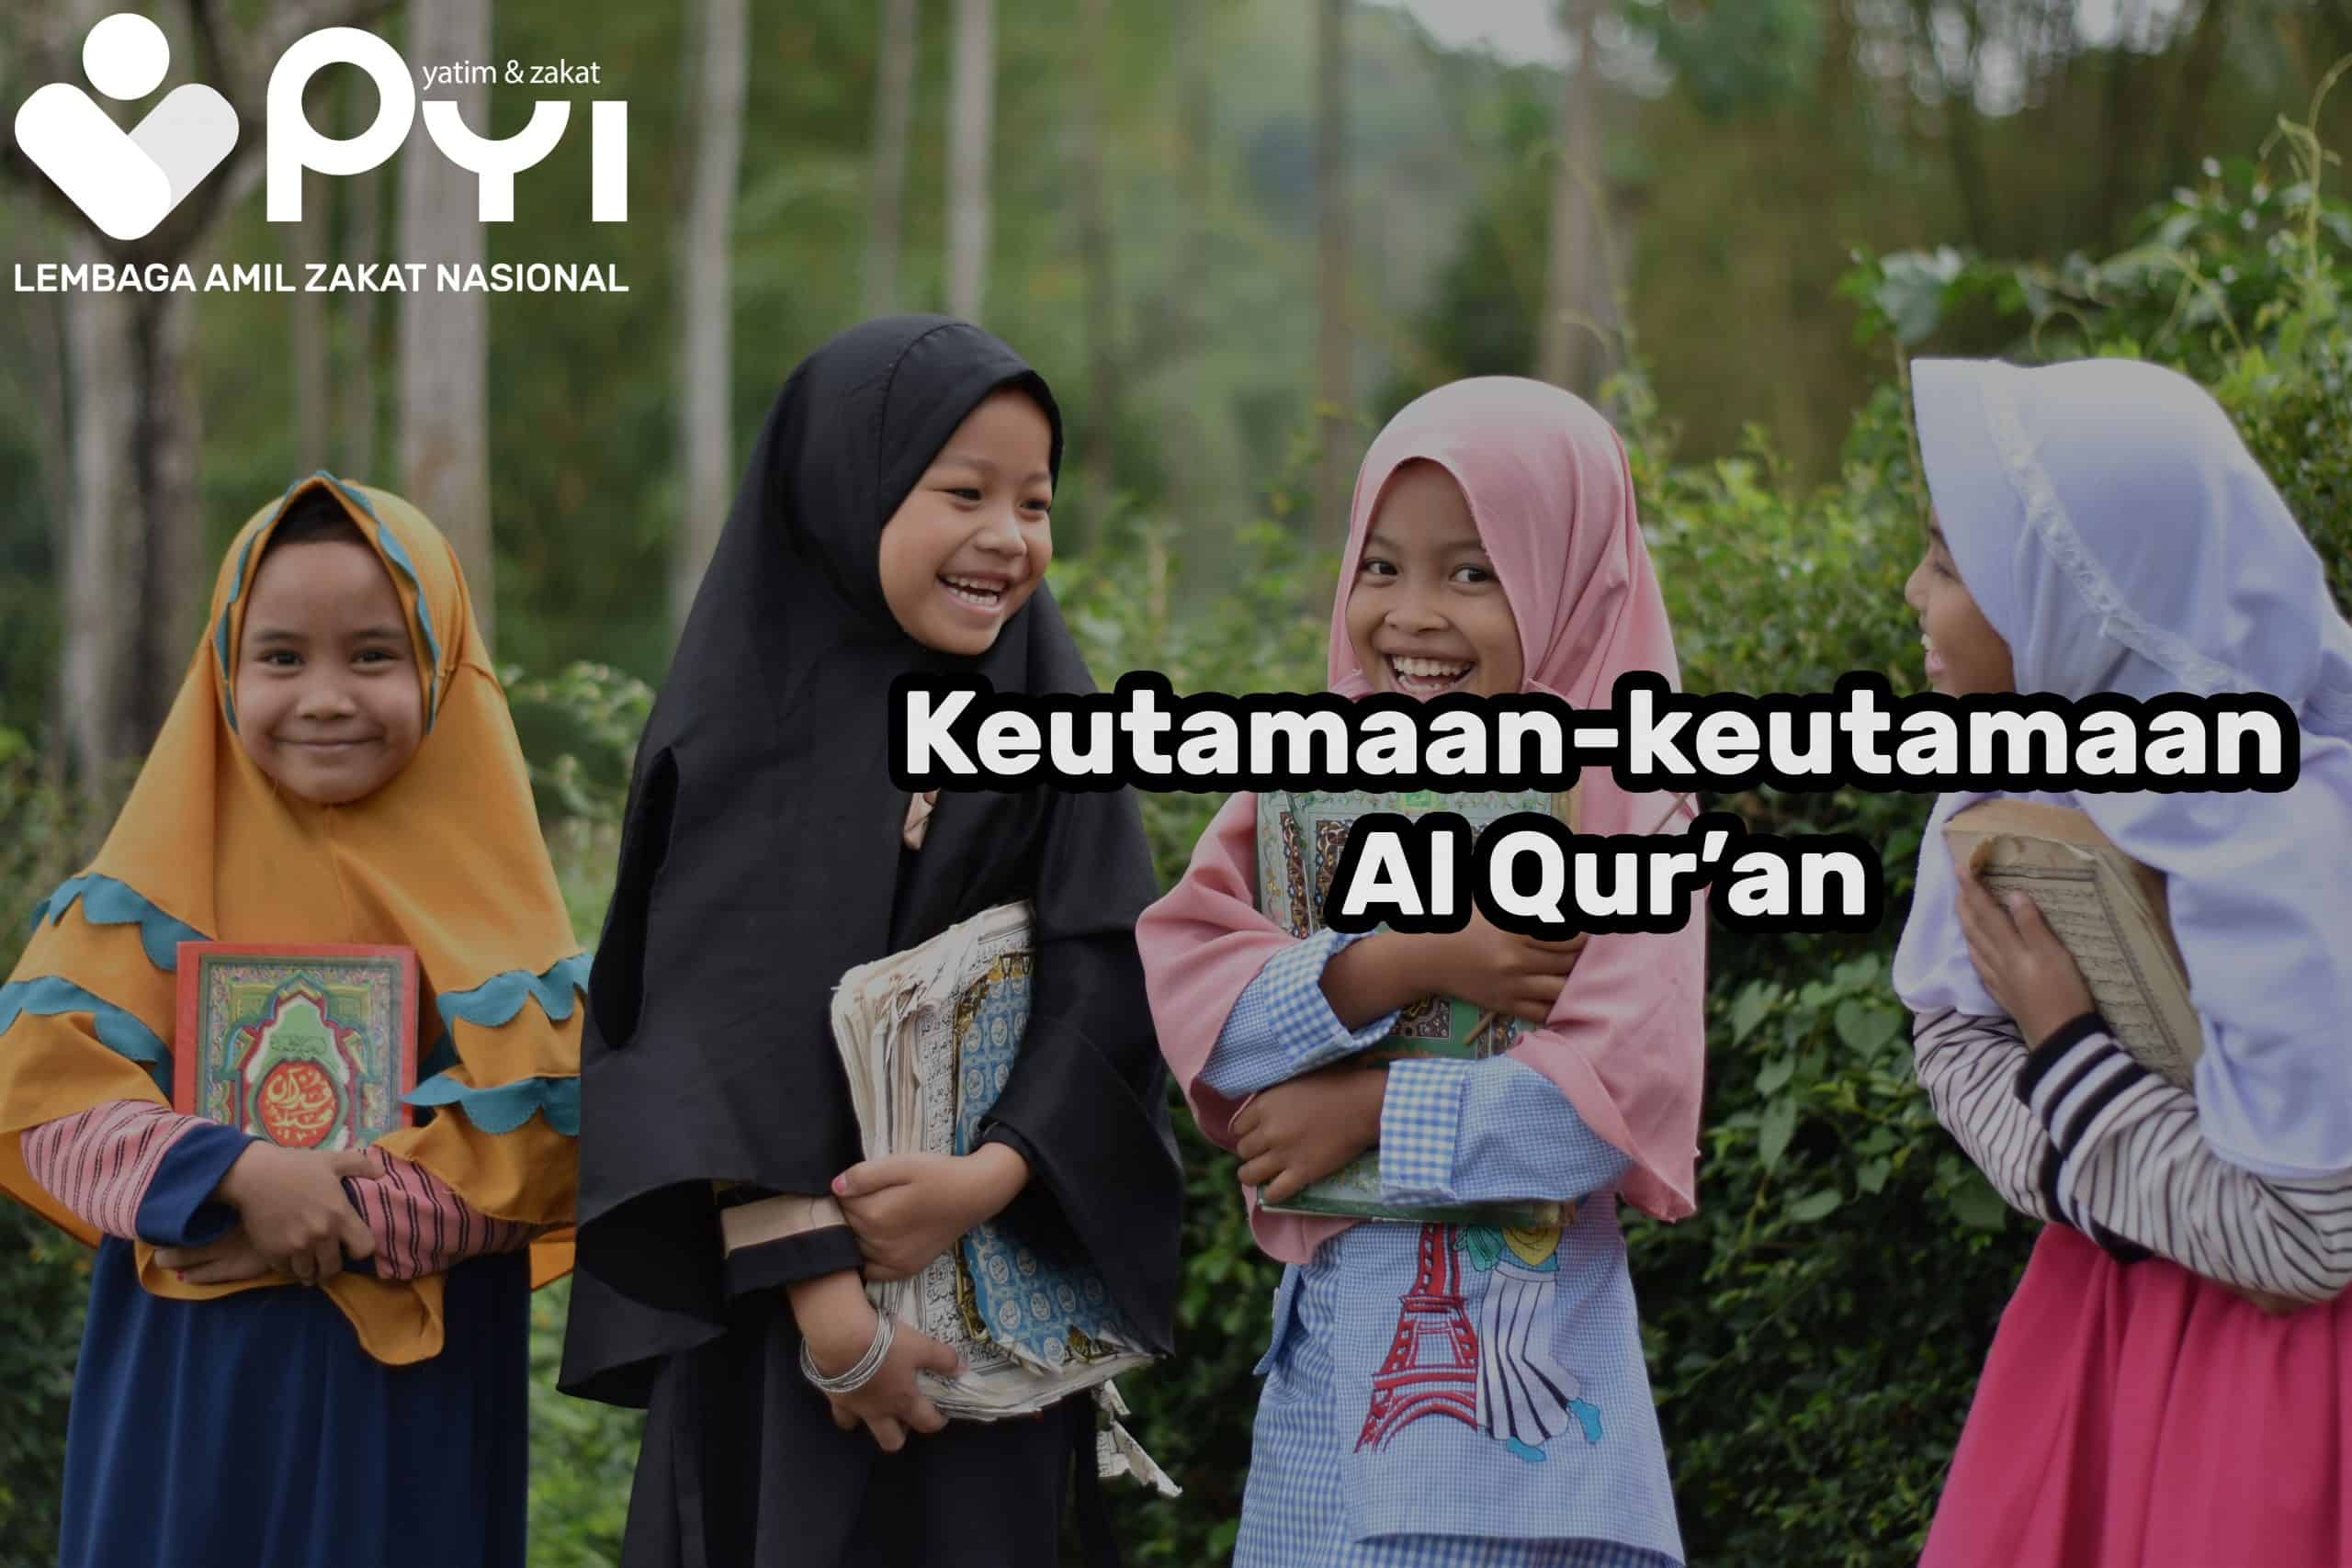 Keutamaan-Keutamaan Al Qur'an